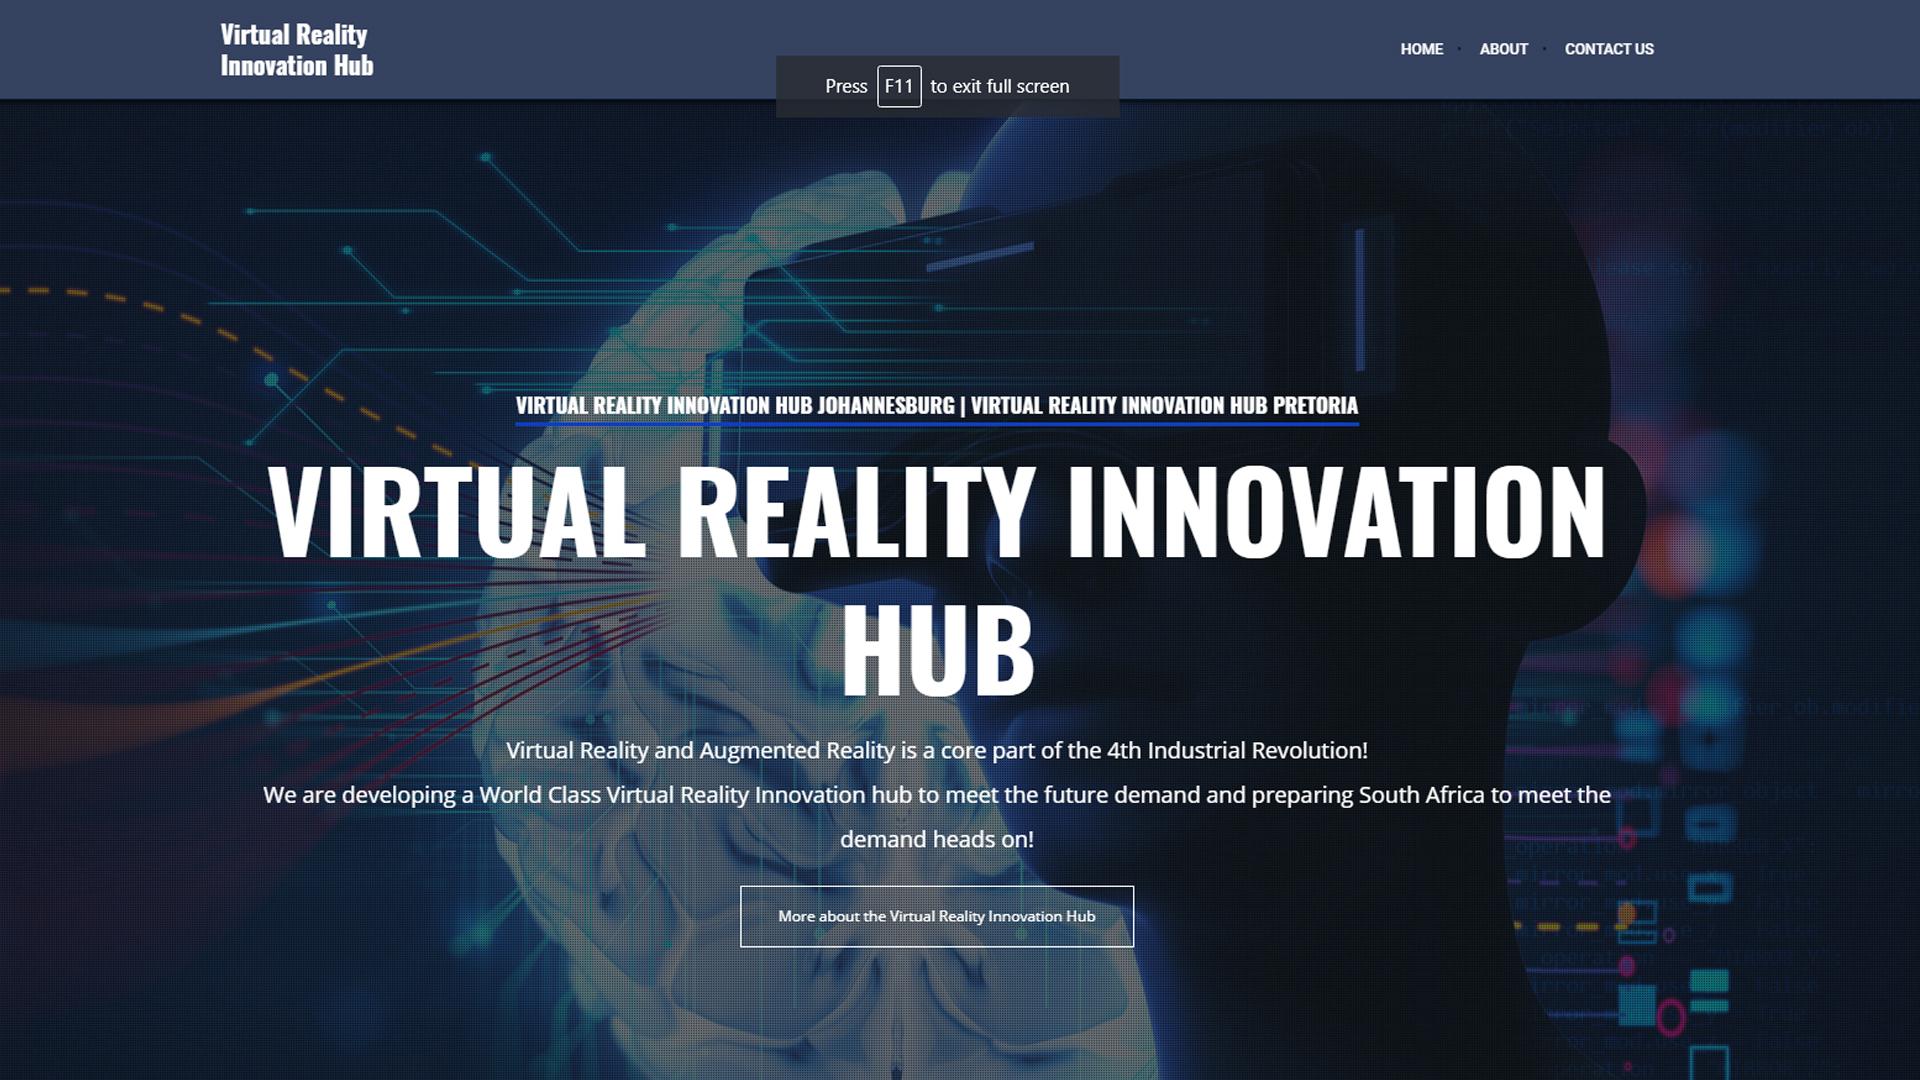 virtual reality innovation hub